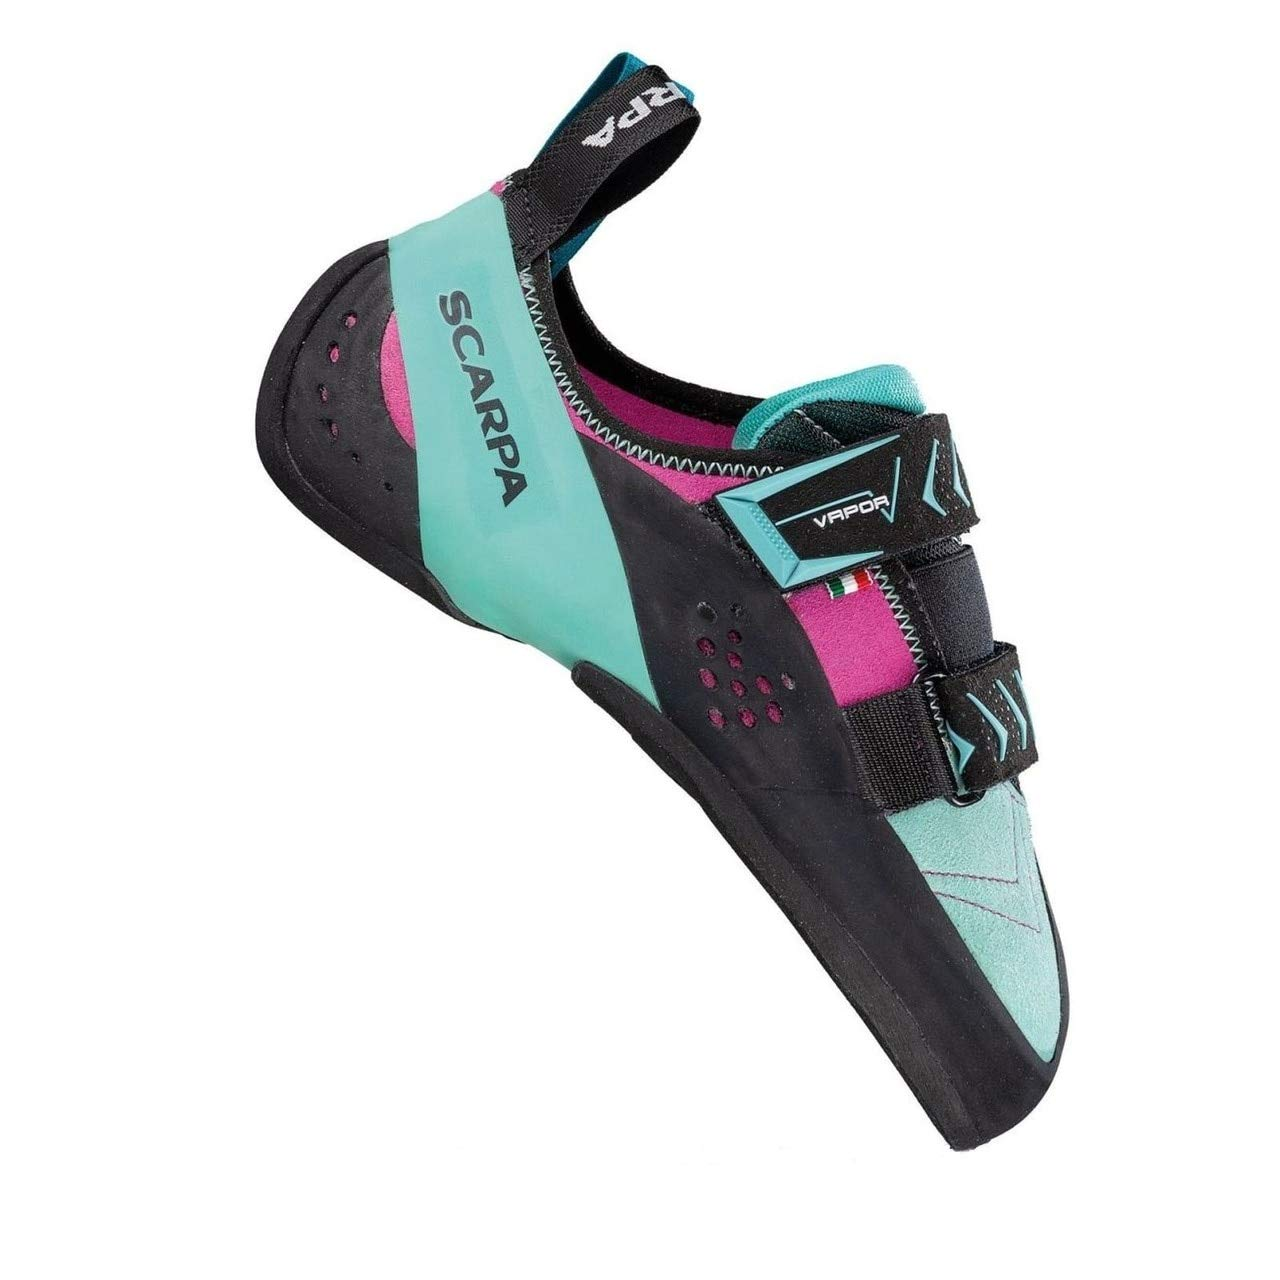 SCARPA Vapor V Climbing Shoe - Women's Dahlia/Aqua 37.5 by SCARPA